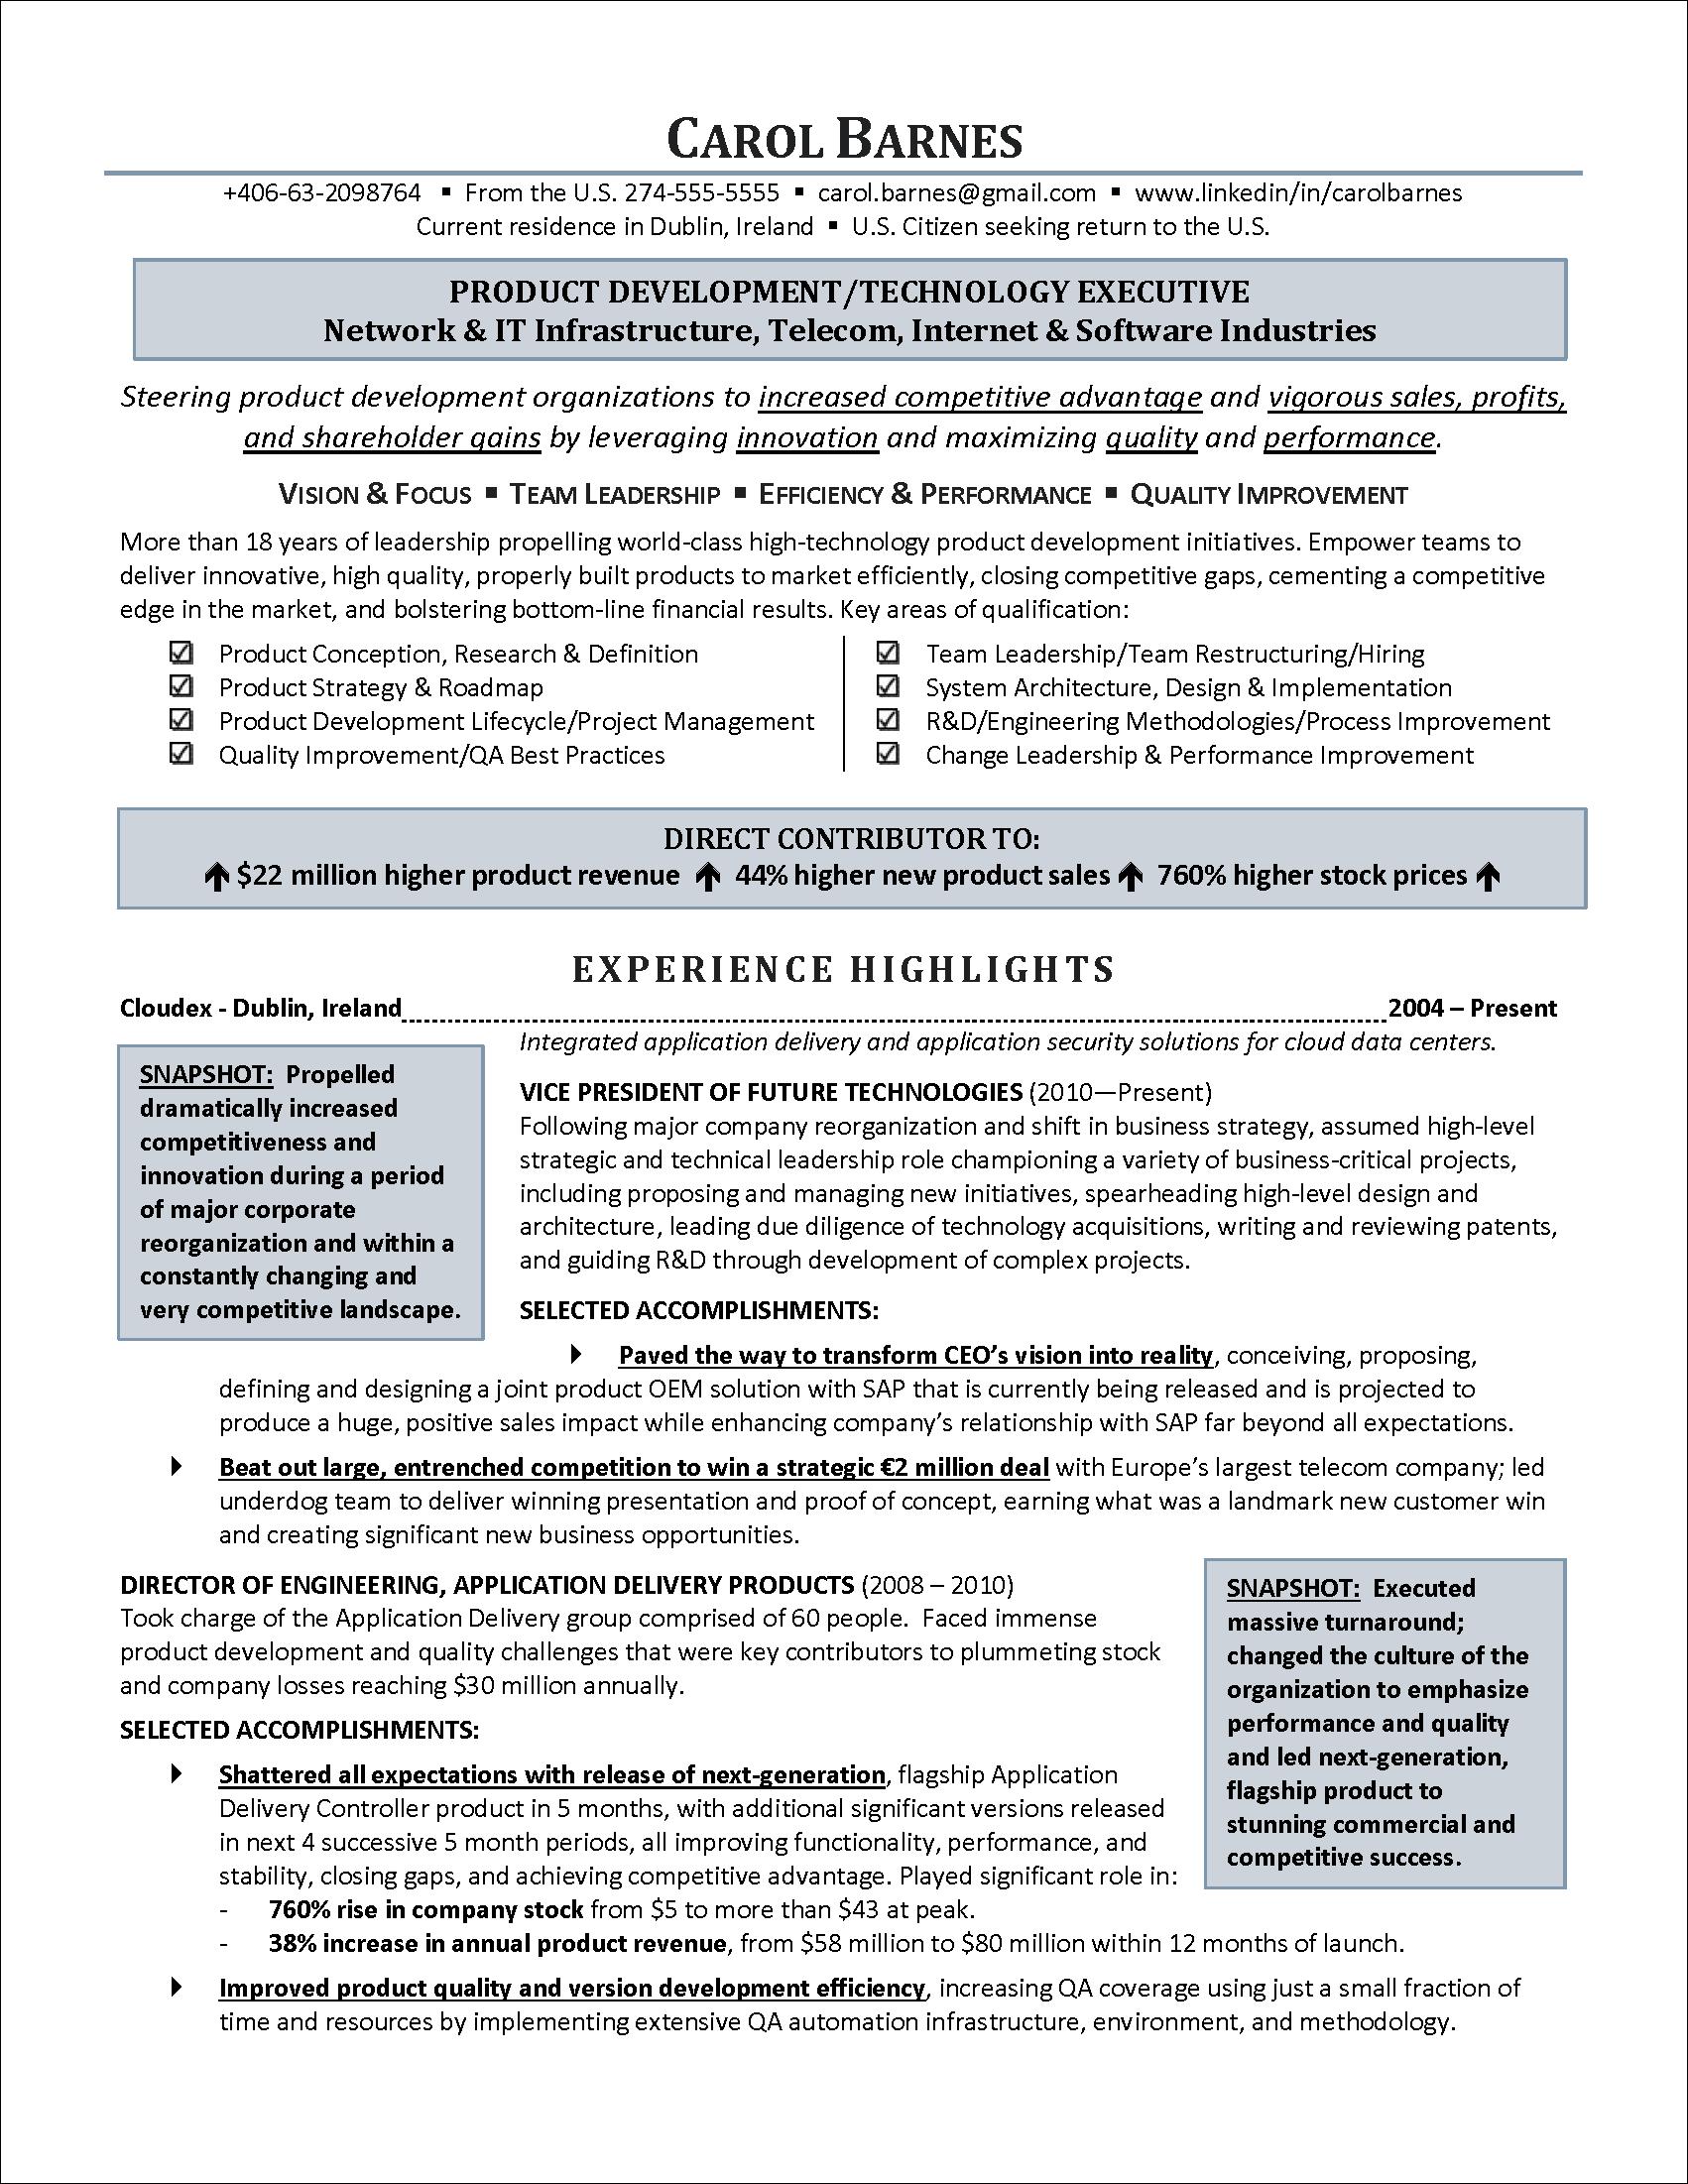 An information technology executive resume written for a U